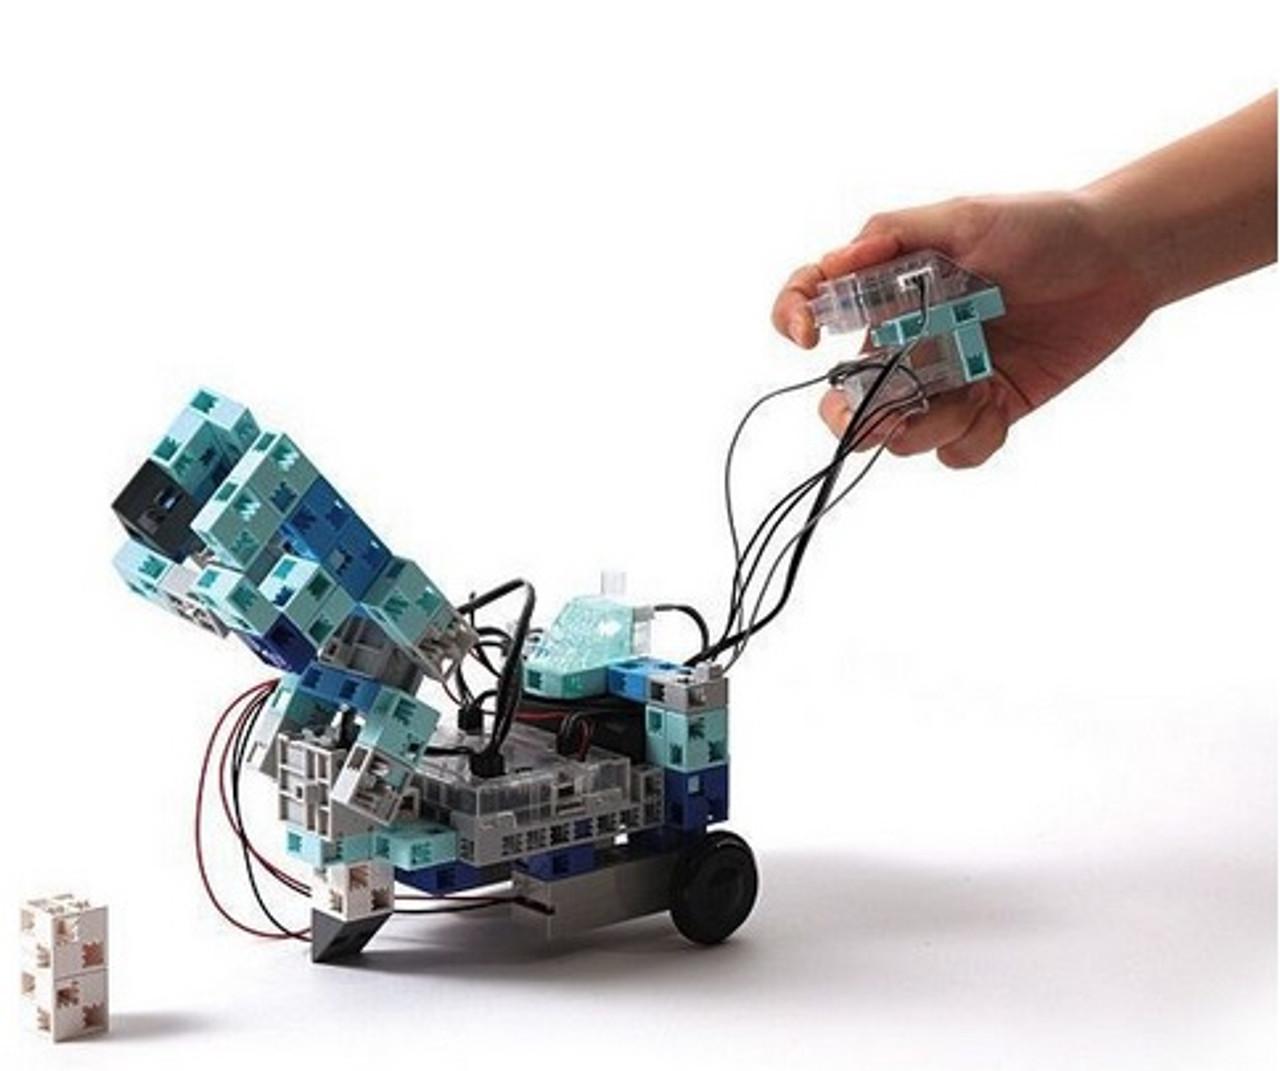 Artec Blocks Robotist Educational Basic Robot Toy Building Kit